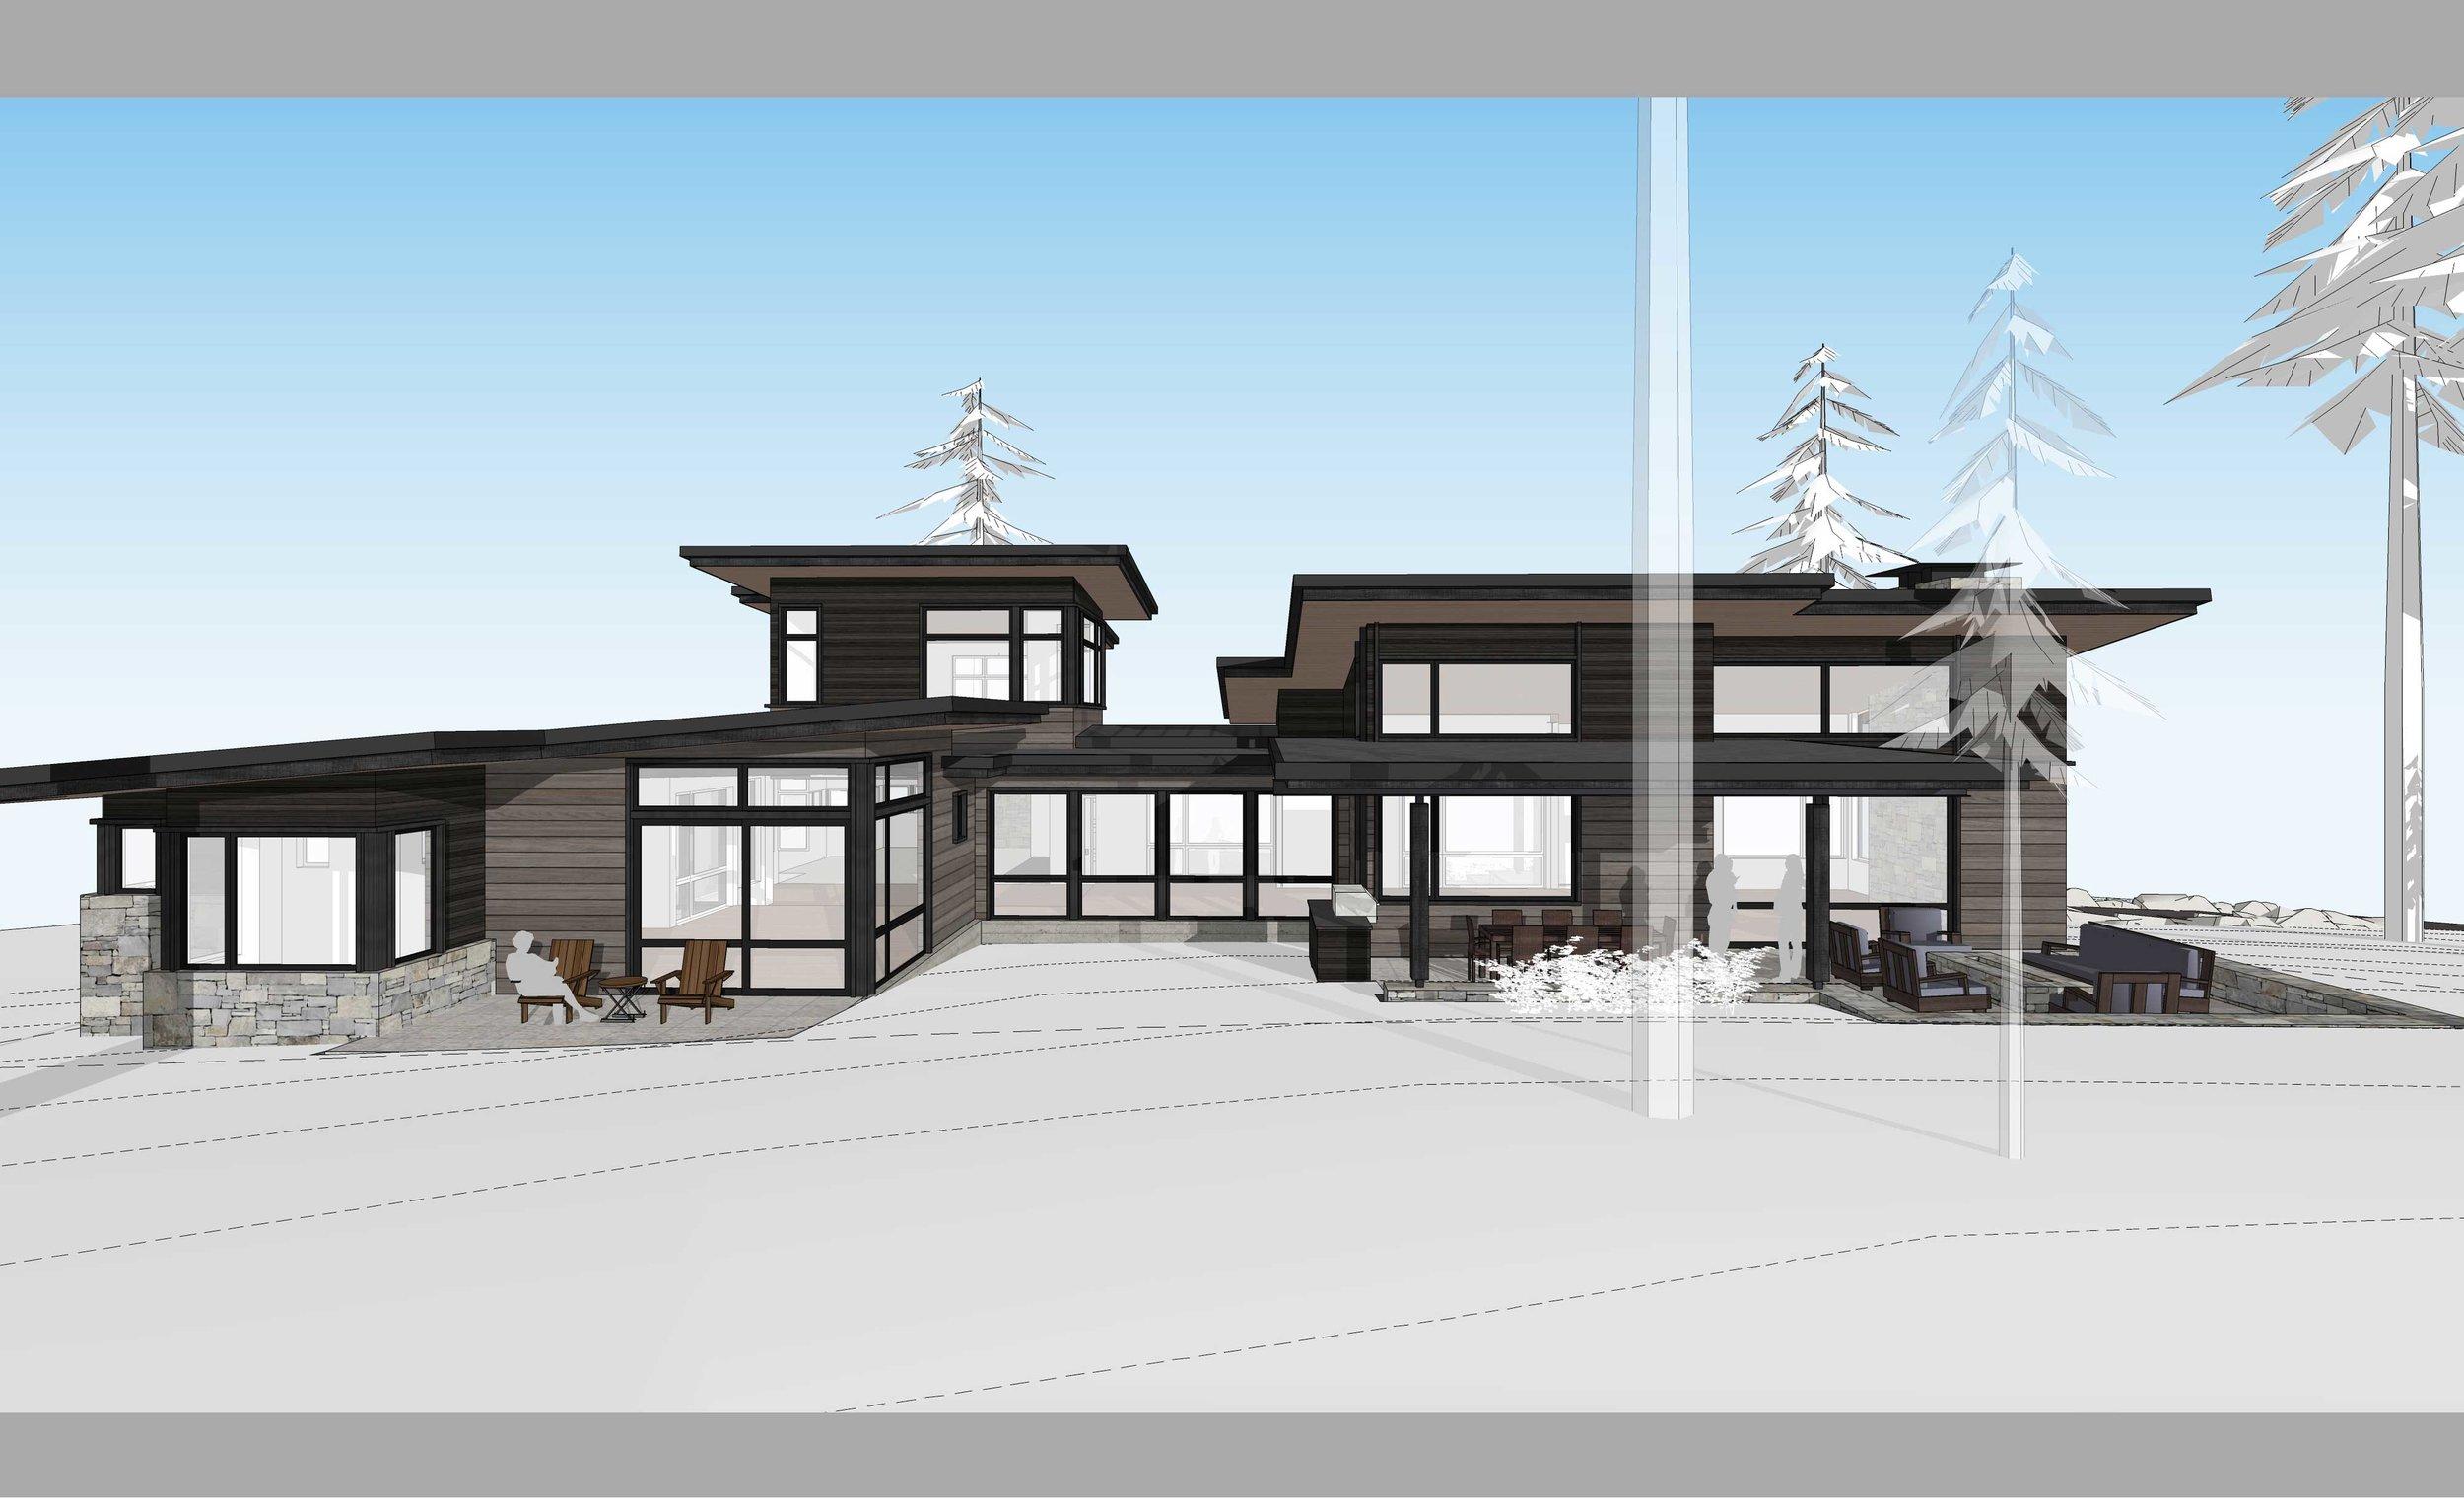 Contractor: Morrison Customs Interiors: Walton Architecture + Engineering Square Footage: 3,875 sf bedrooms: 4 bathrooms: 3.5